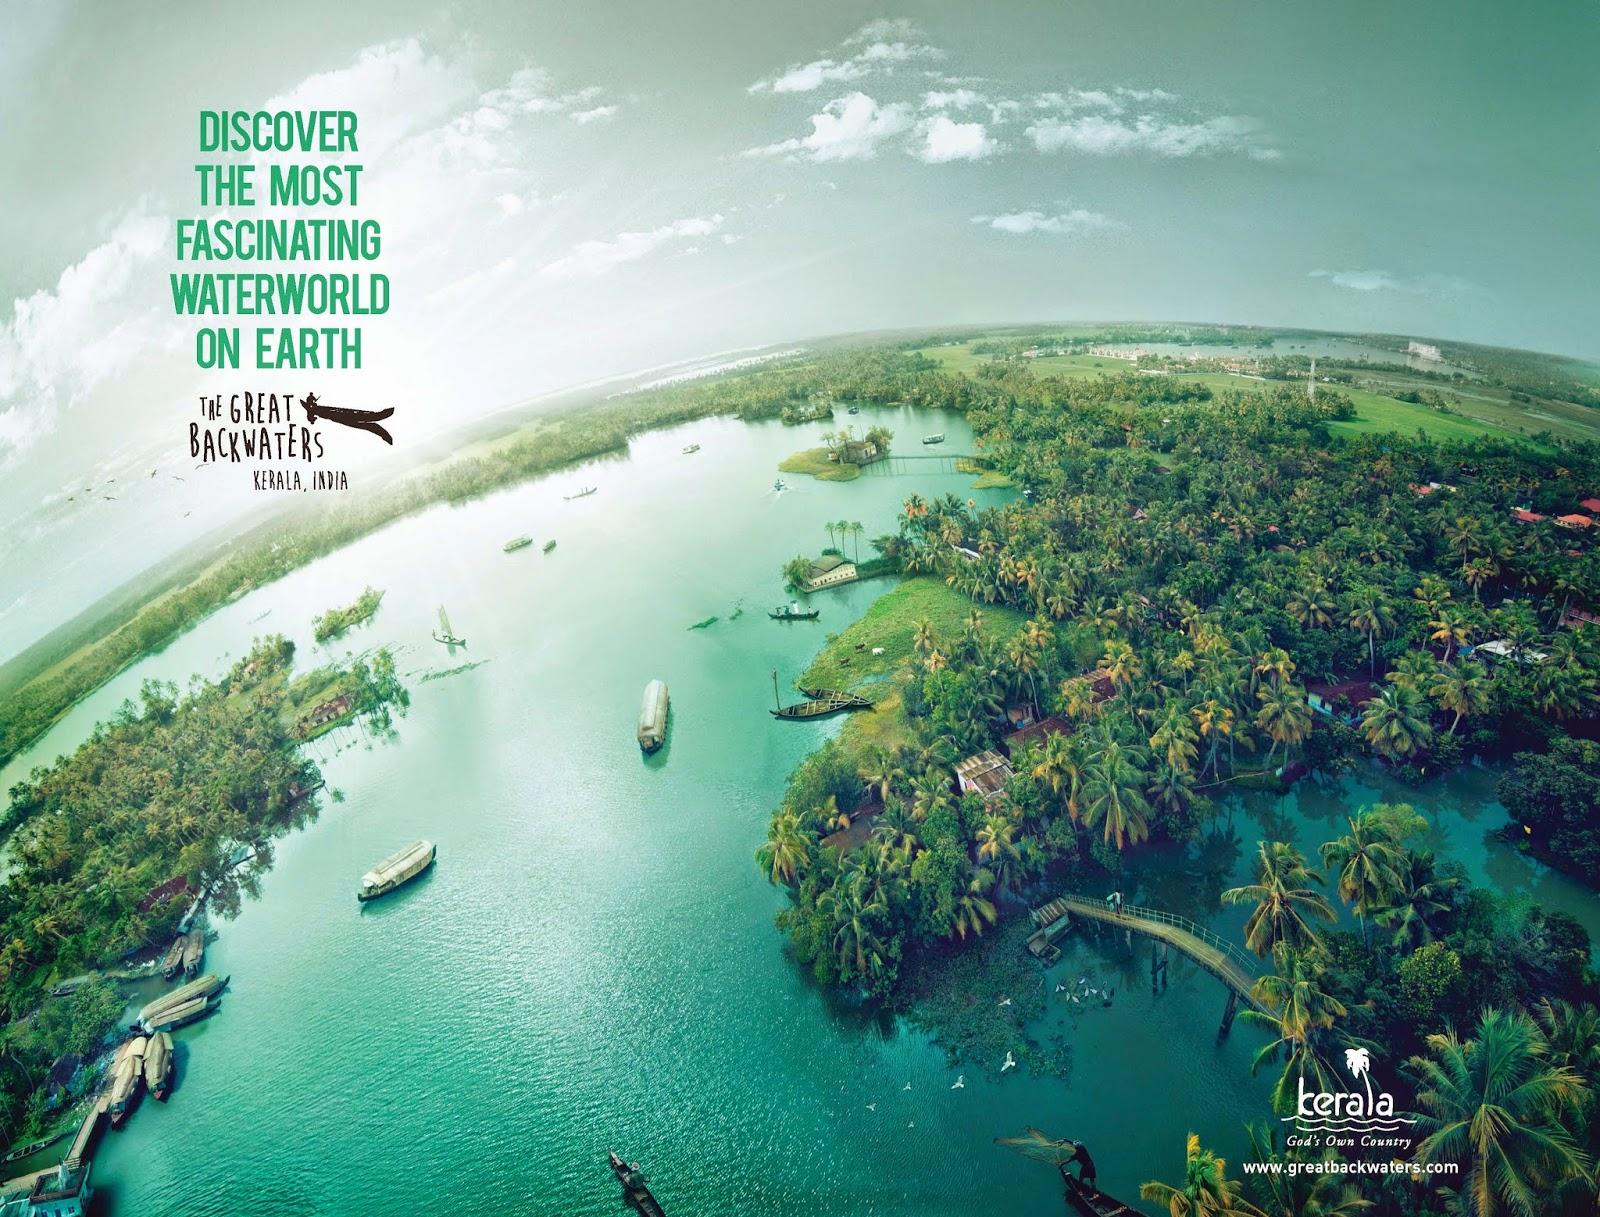 The Great Backwaters Campaign | Kerala Tourism | New Water World - Backwaters of Kerala 3 | Stark Communications Pvt Ltd